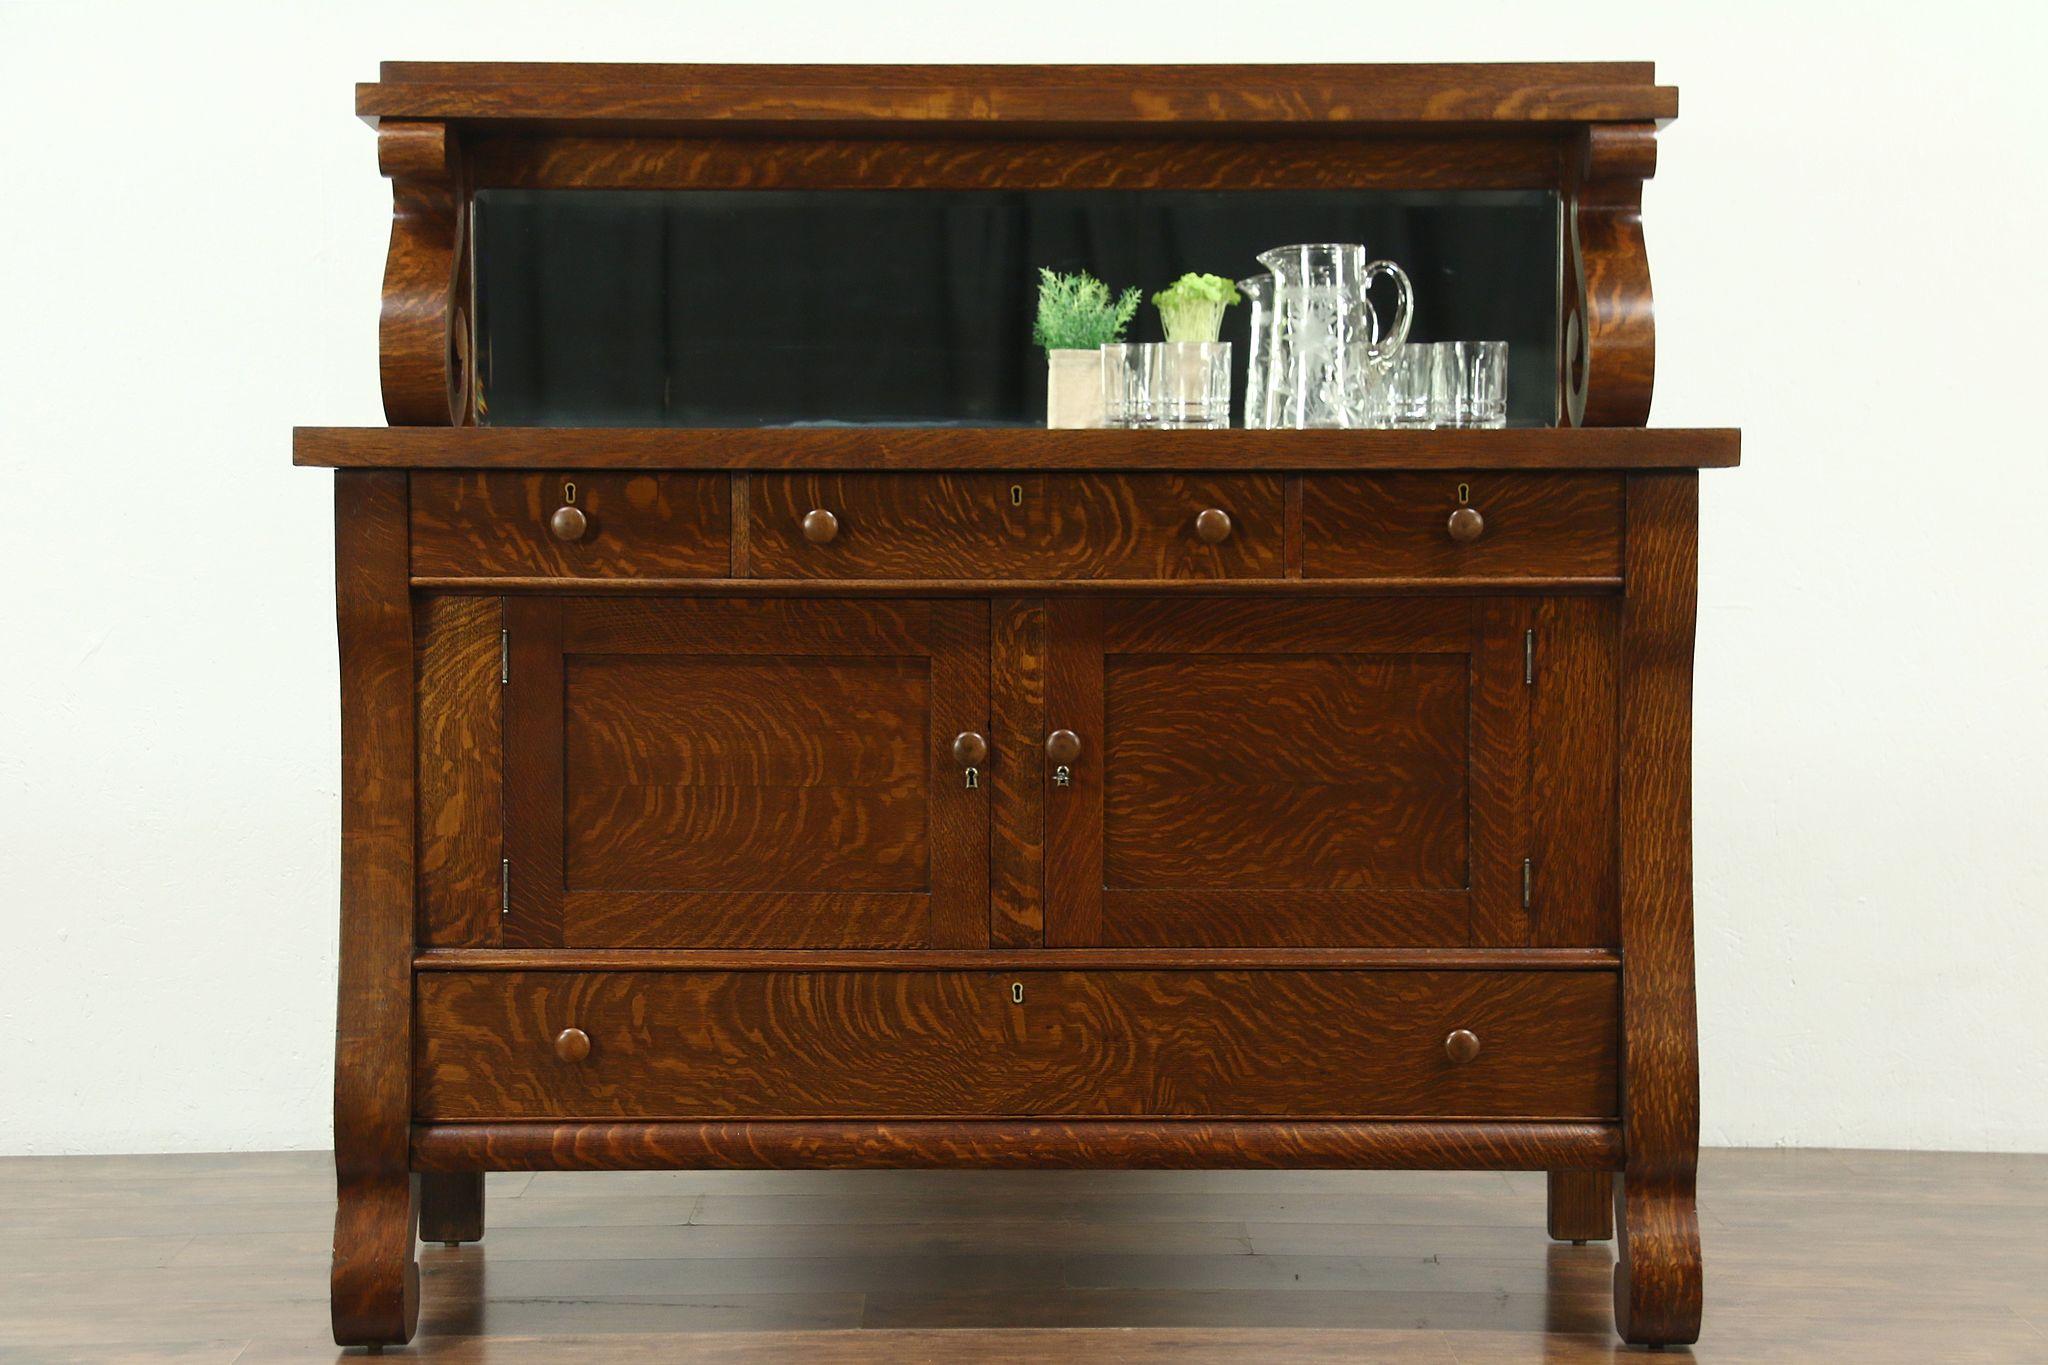 Oak Empire 1900 Antique Sideboard